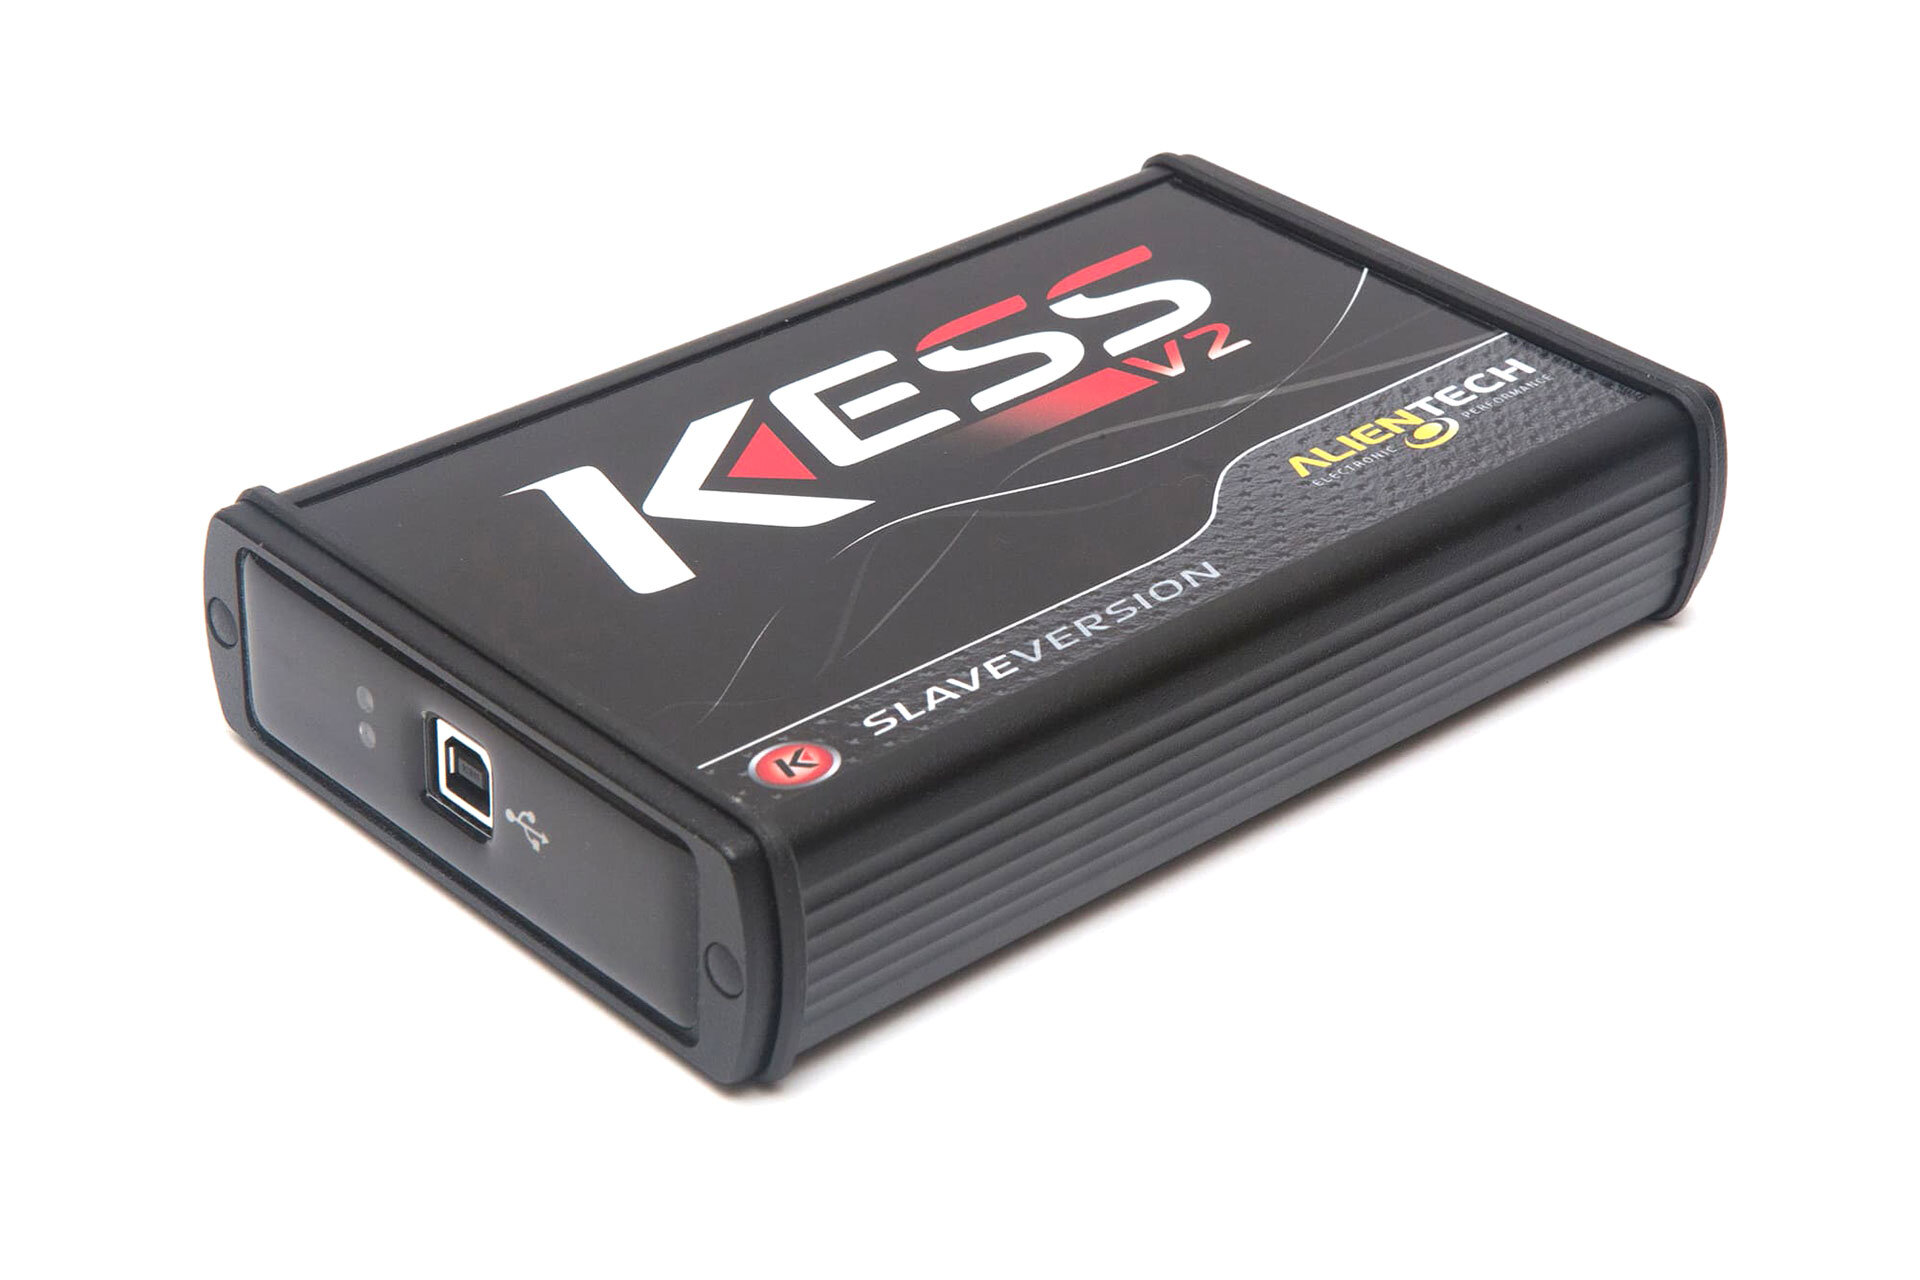 KessV2 OBD Chiptuning tool